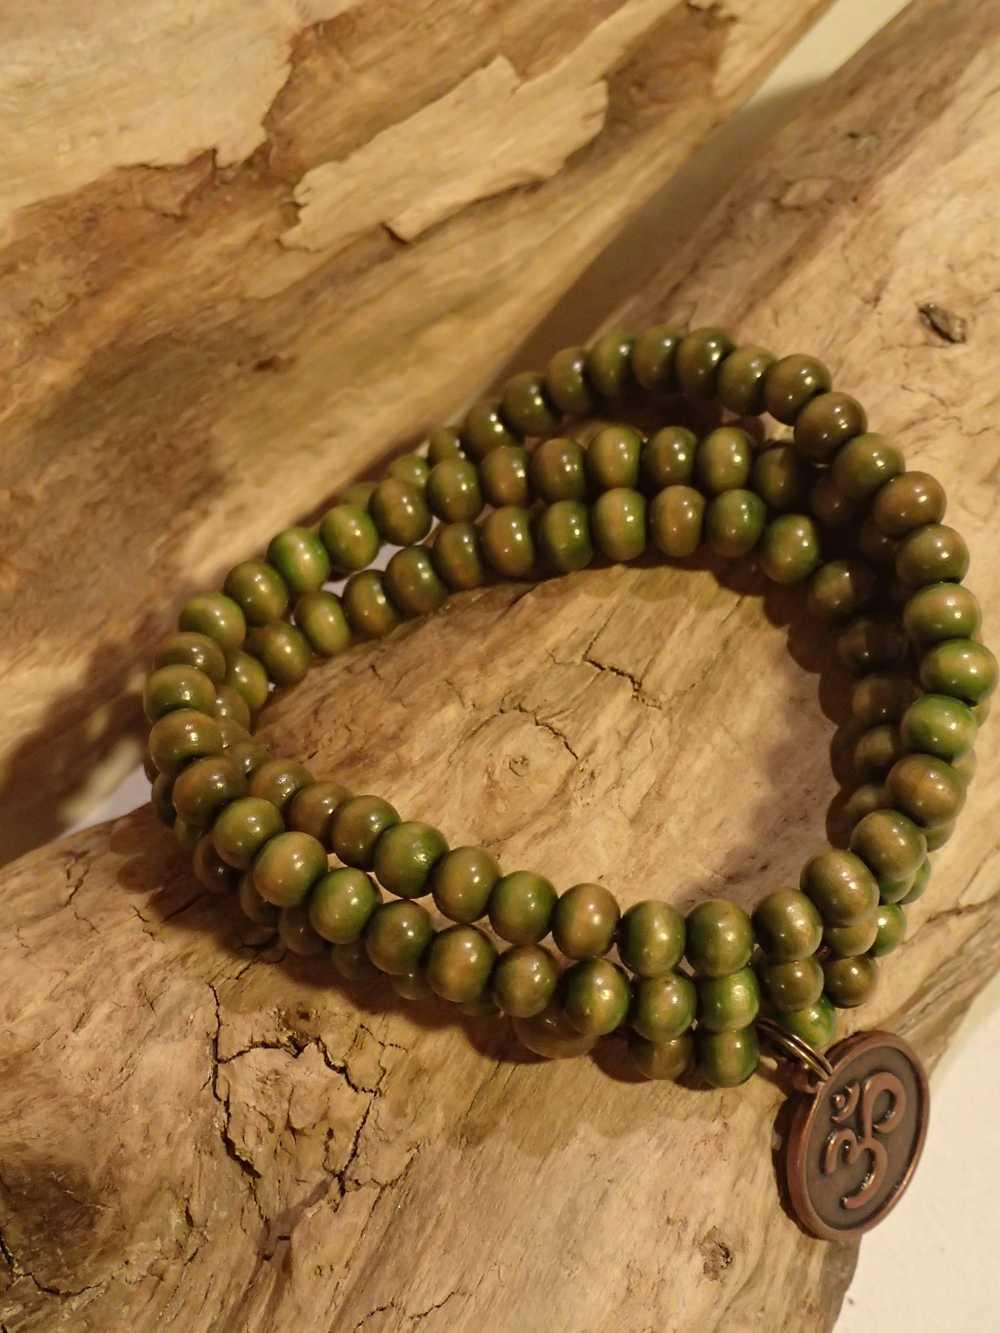 Atome-Crochu-_-product-_-collier-bracelet-mala-tibetain-en-bois-et-om-indien-02